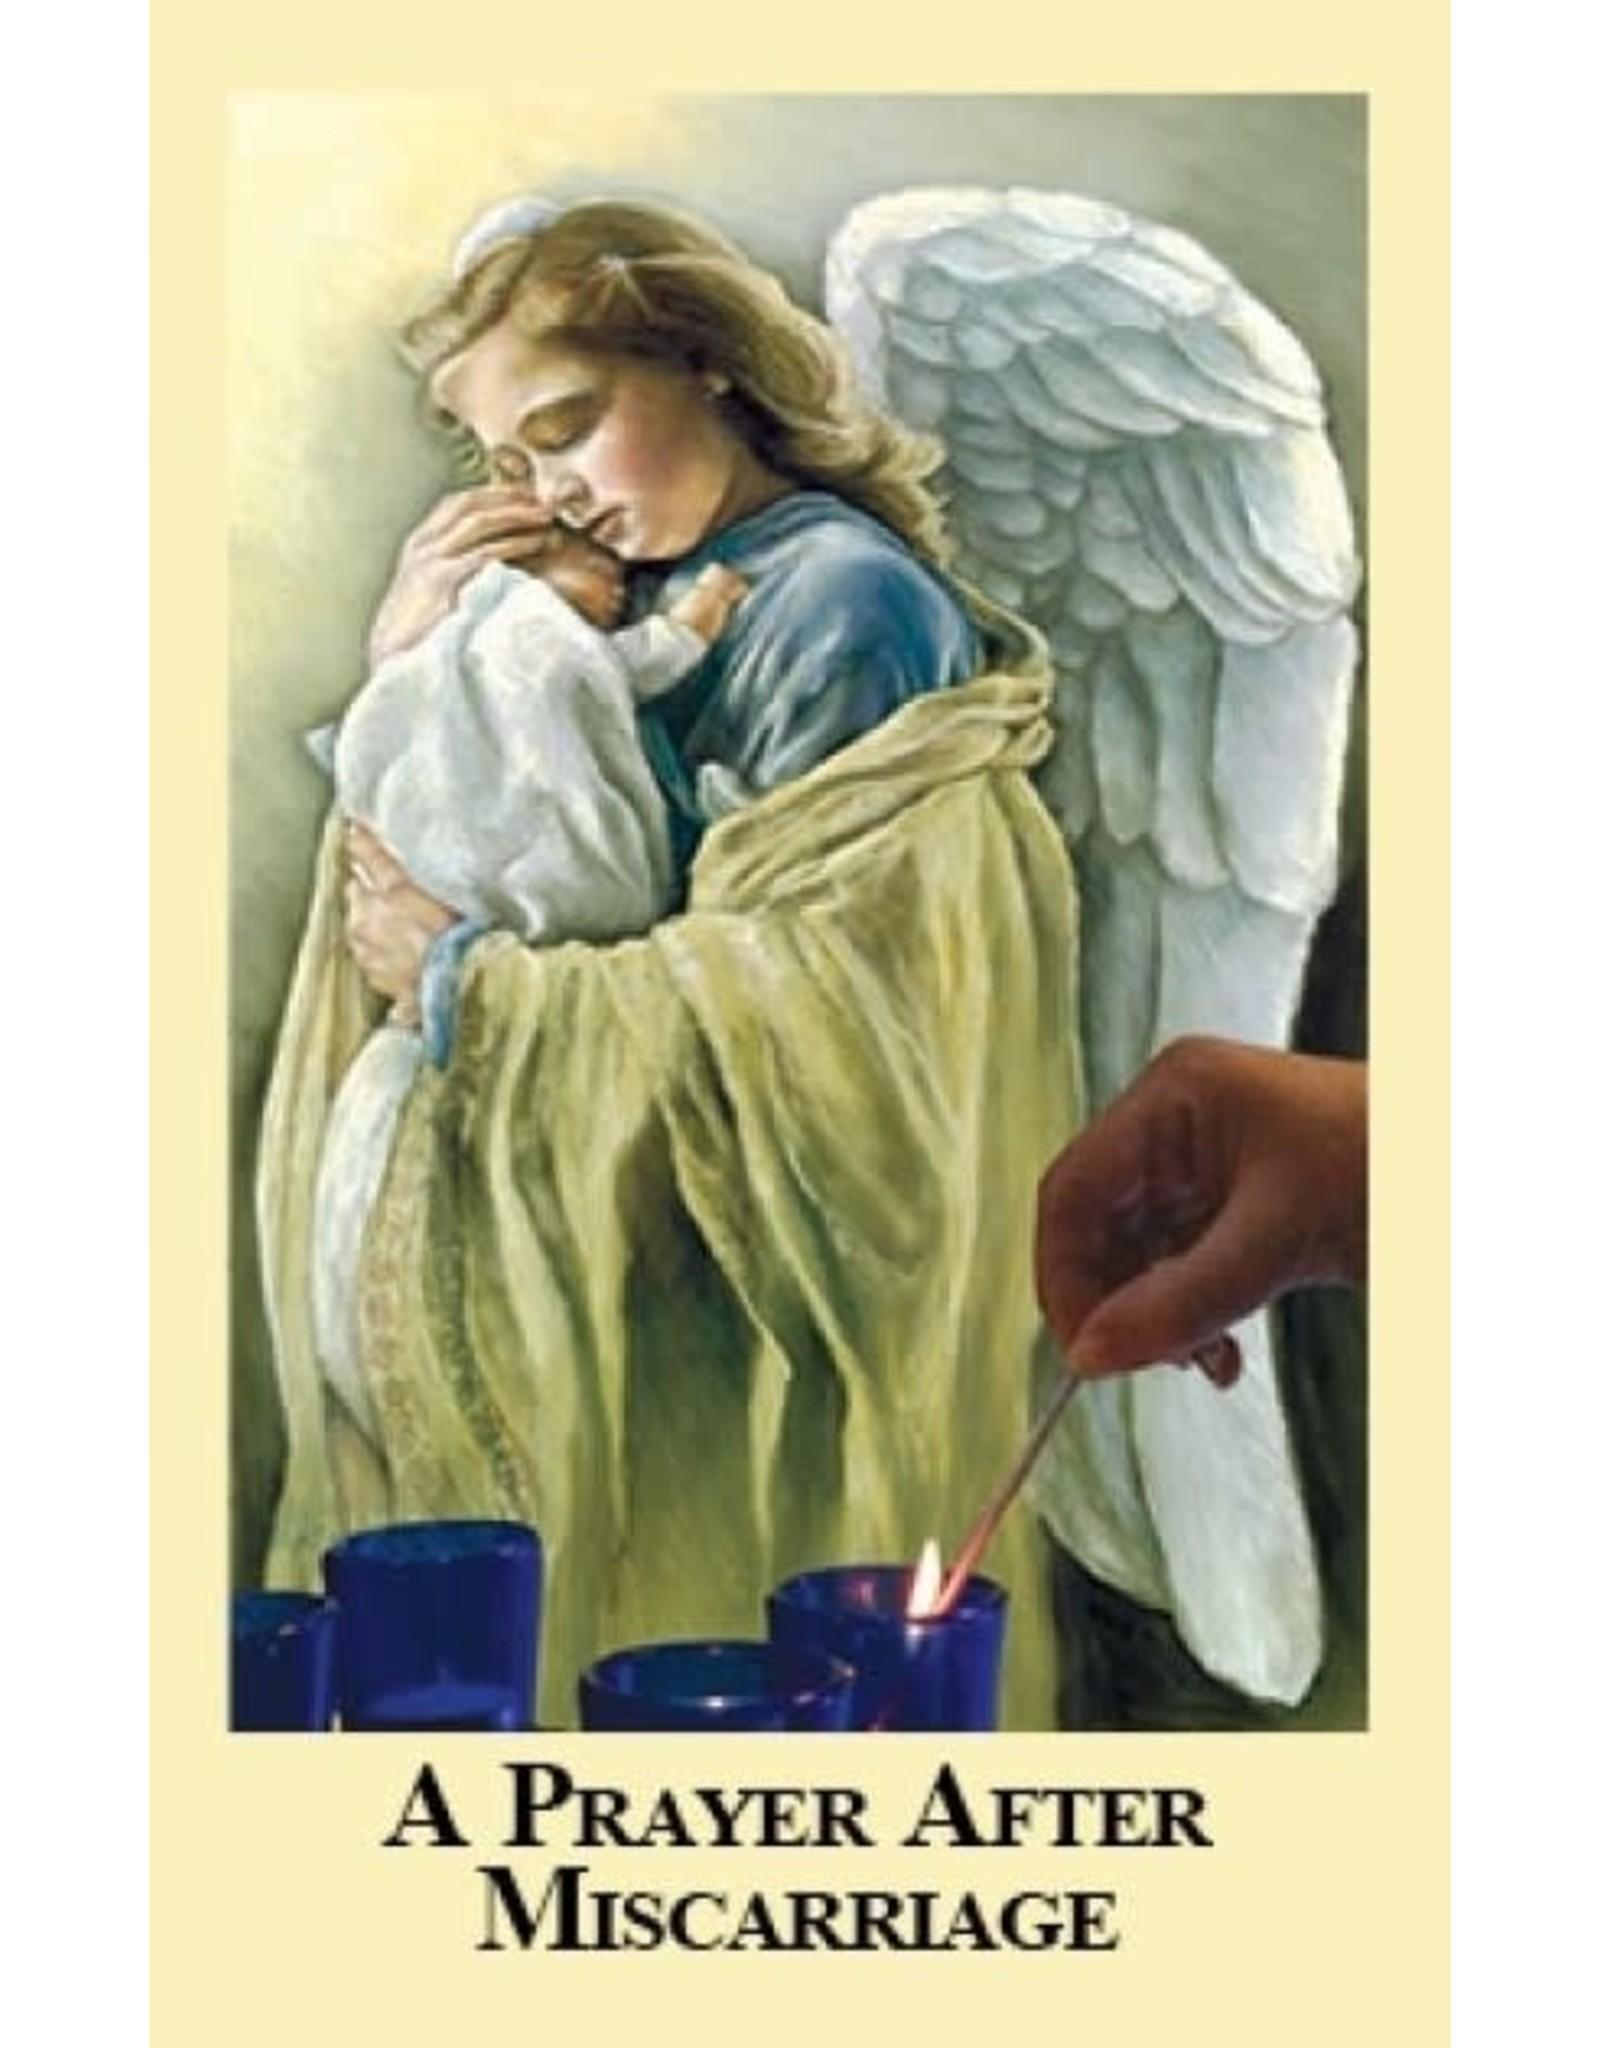 Association of Marian Helpers A Prayer After Miscarriage (Prayer Card)